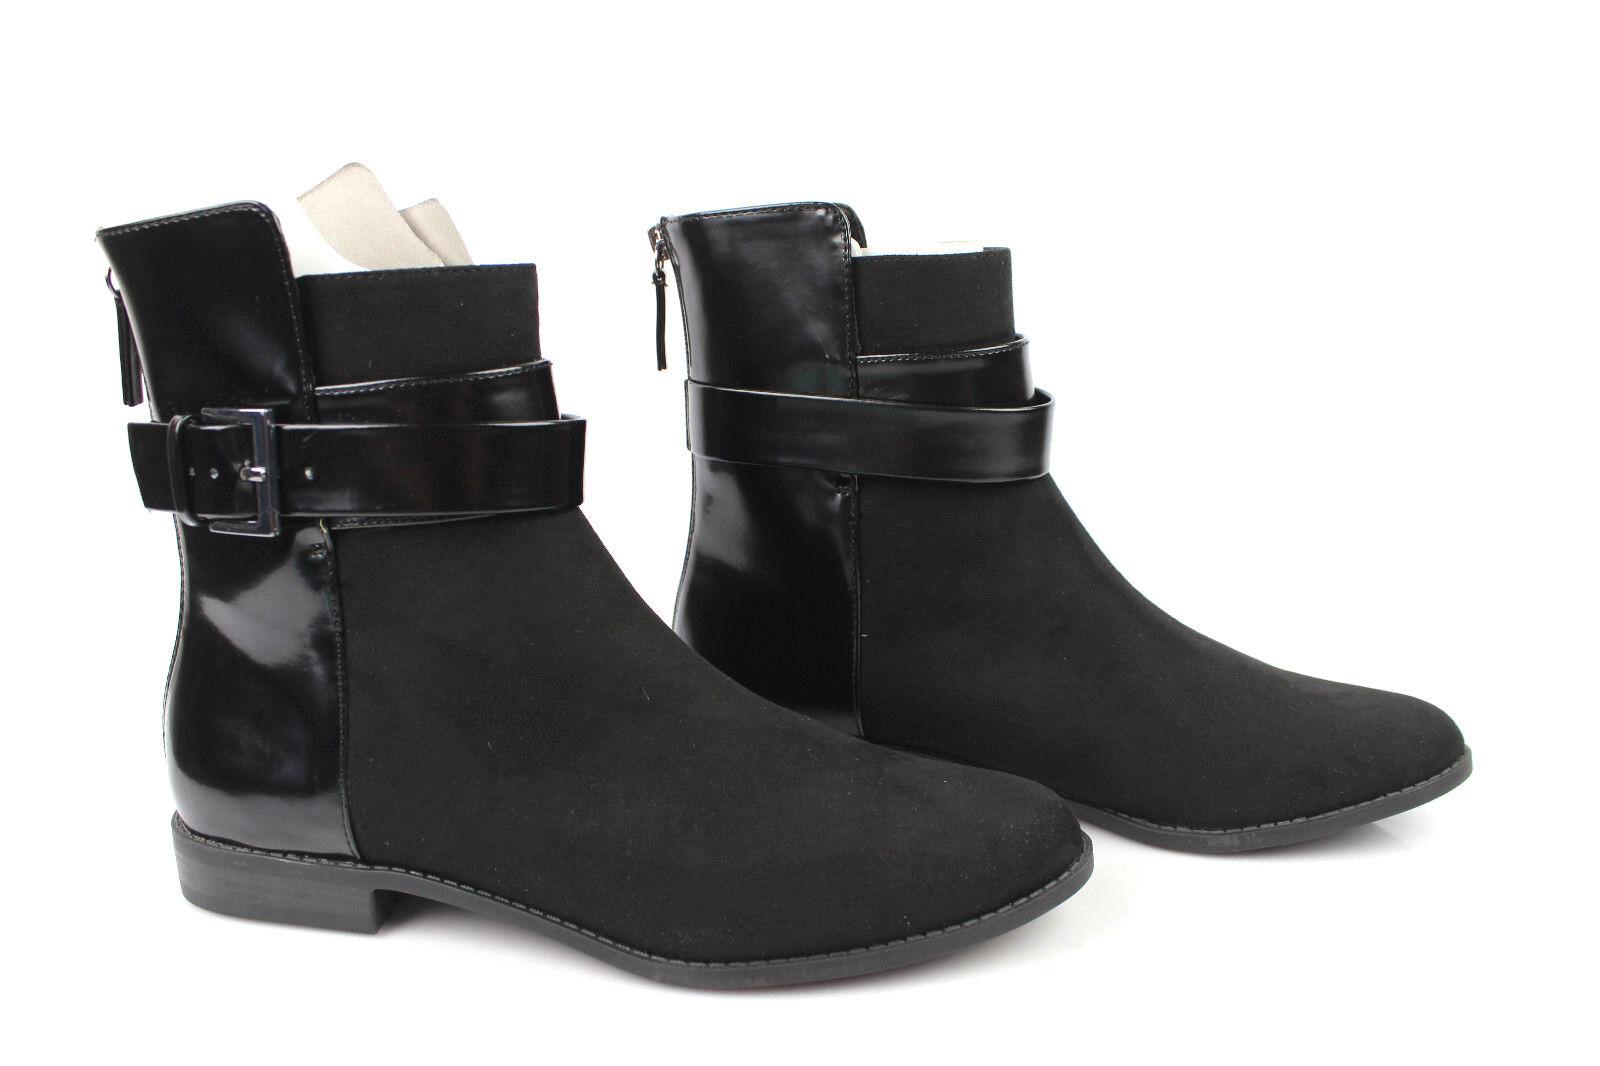 Bottines Boots Cavalières ZARA TRAFALUC black T 42 ETAT NEUF